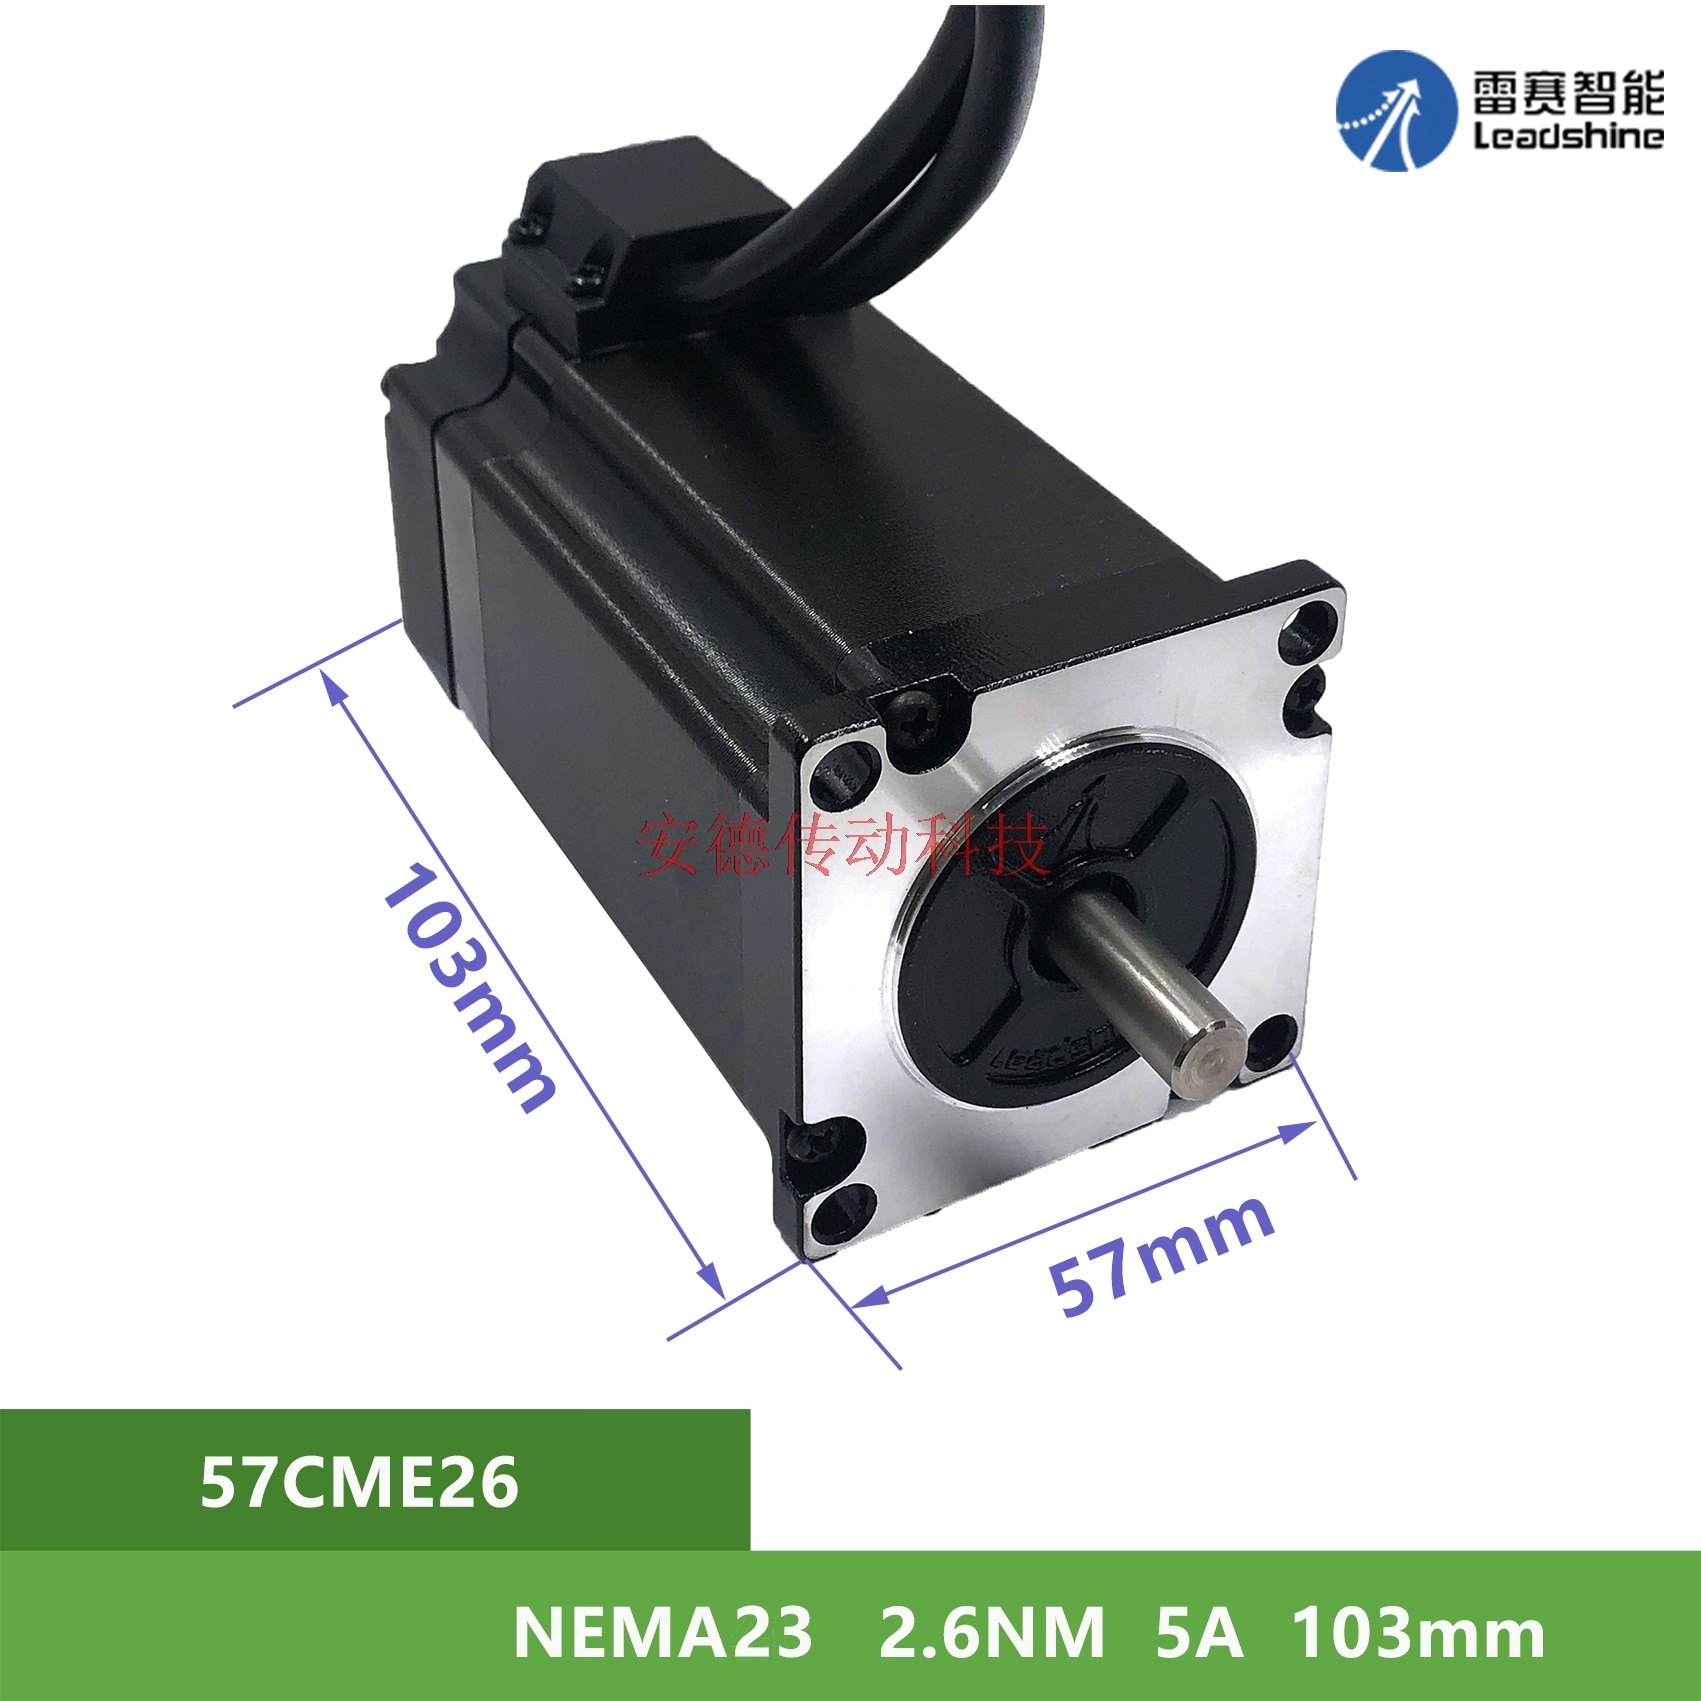 NEMA23 Leadshine 57CME26 2.6Nm 5A مغلق حلقة خطوة المحرك 2 المرحلة رمح قطر 8 مللي متر